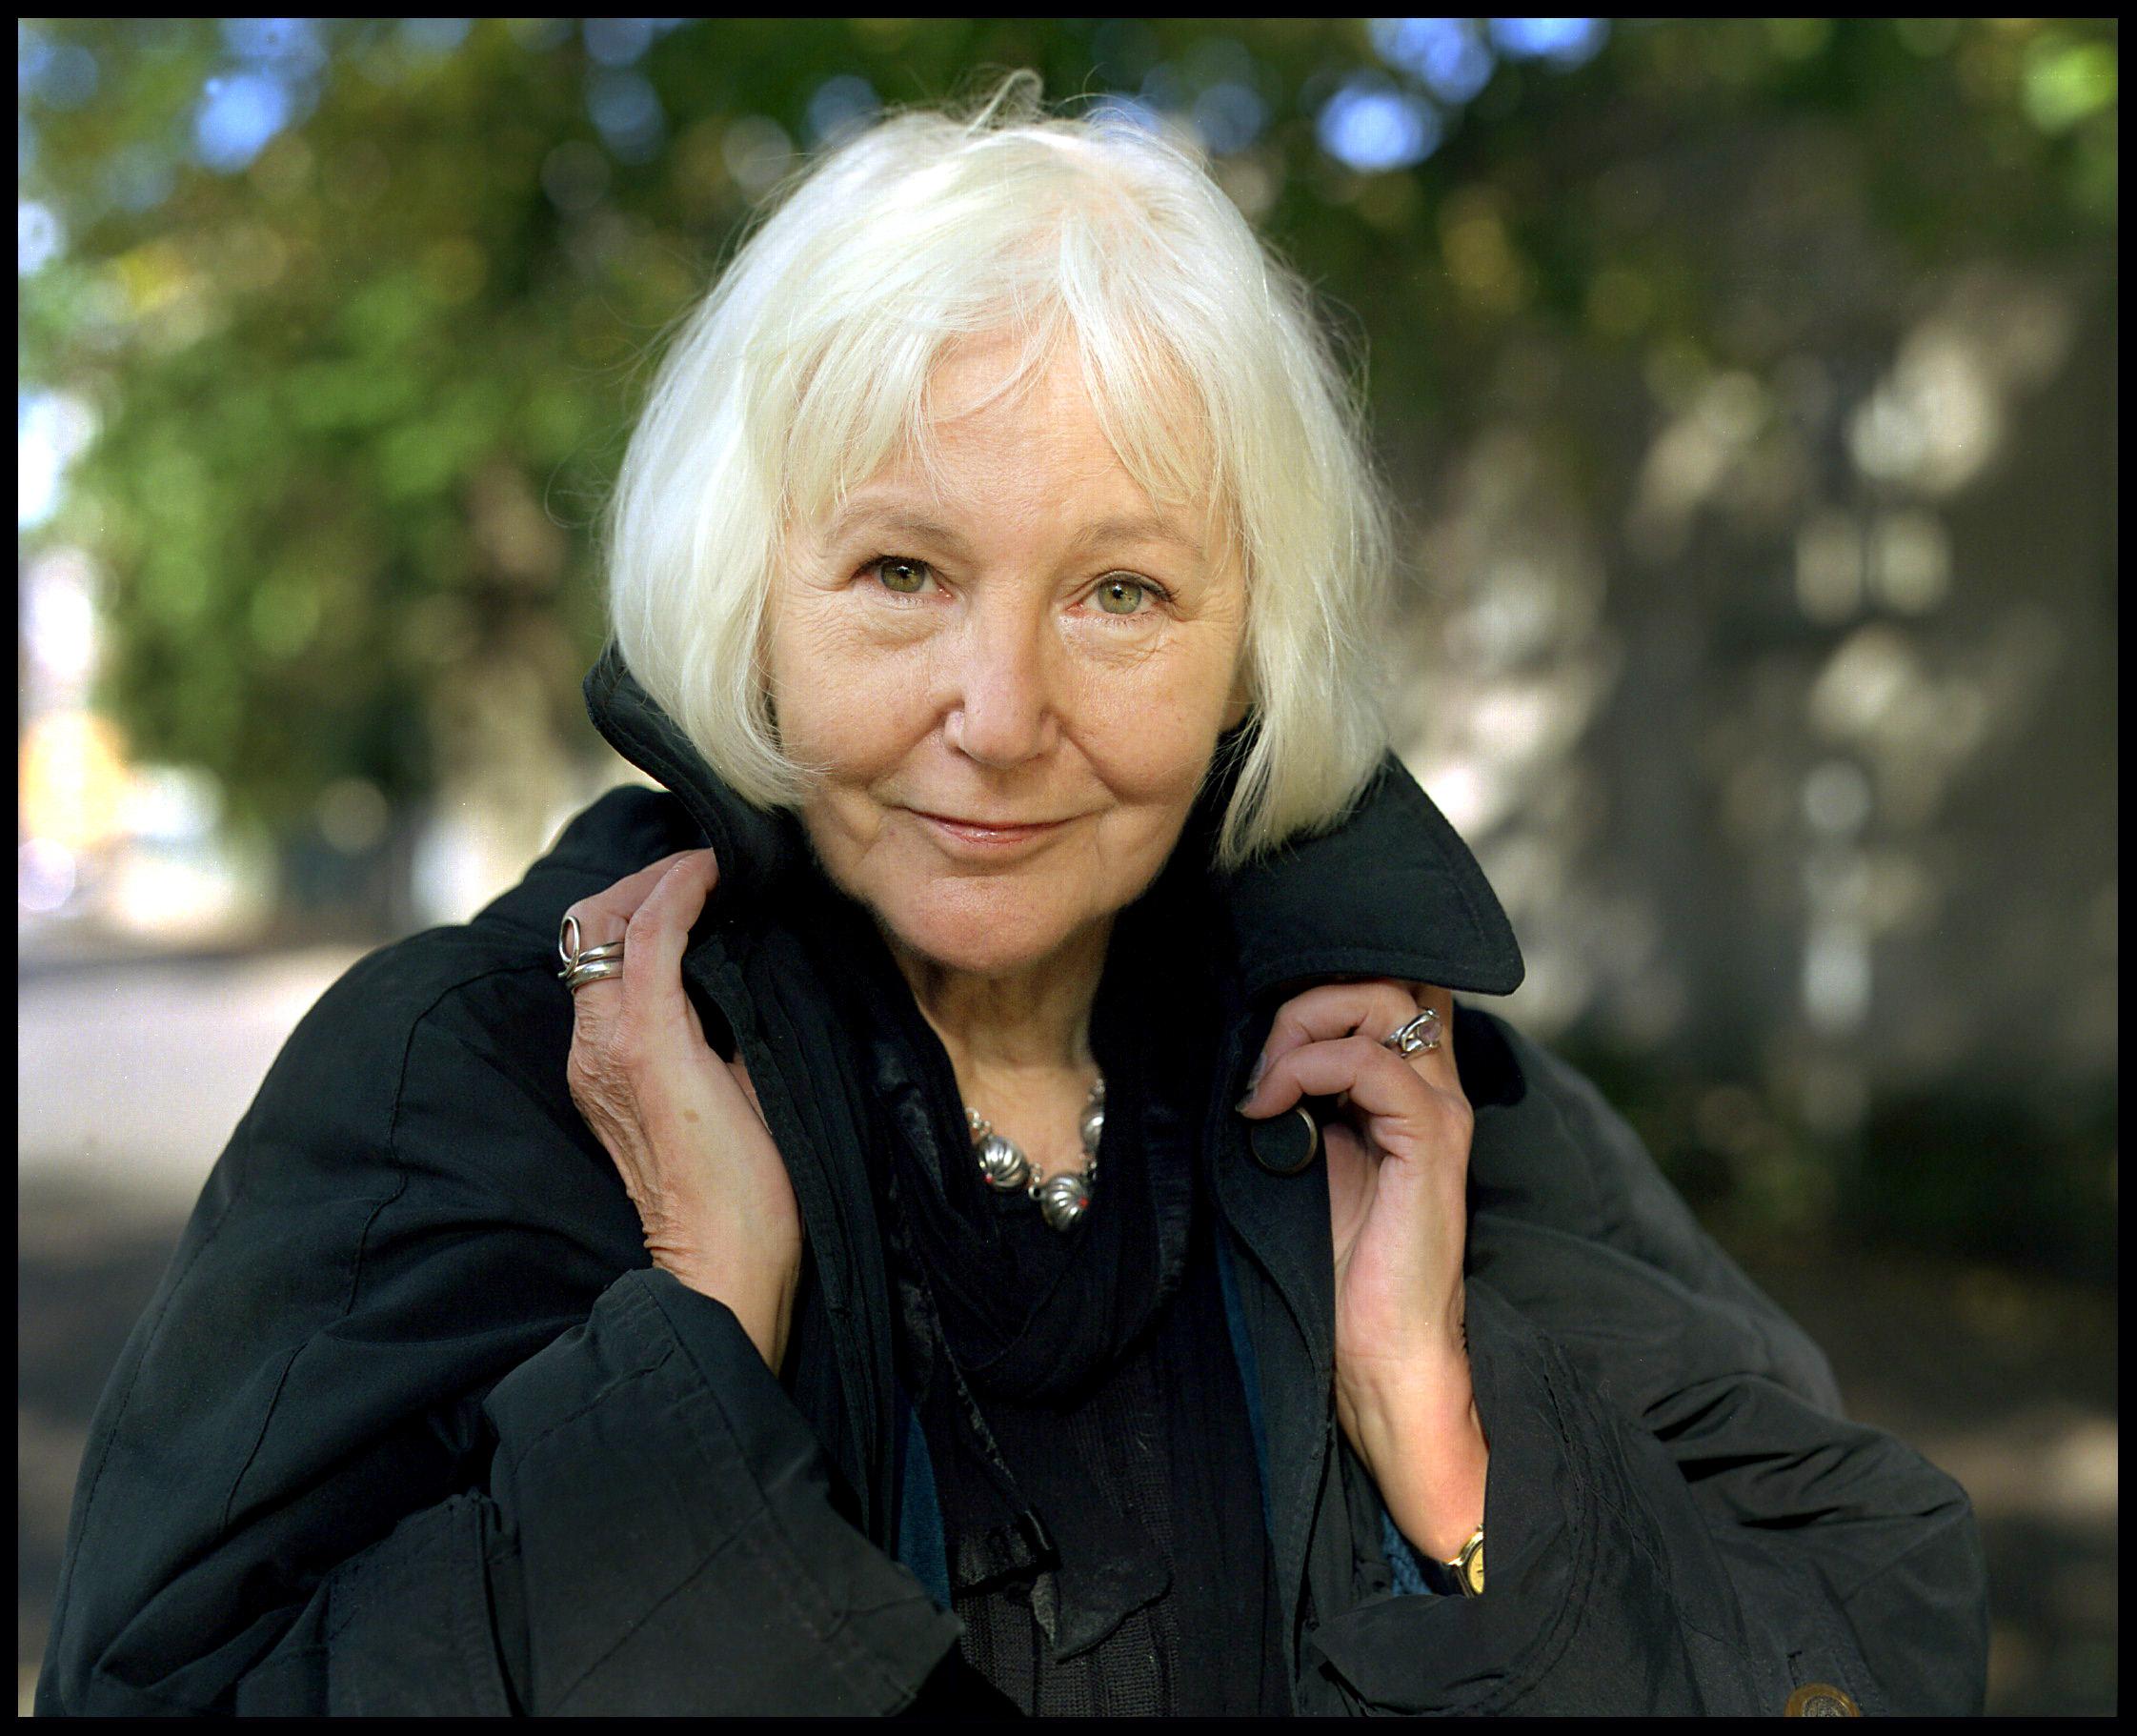 Hanne Marie Svendsen